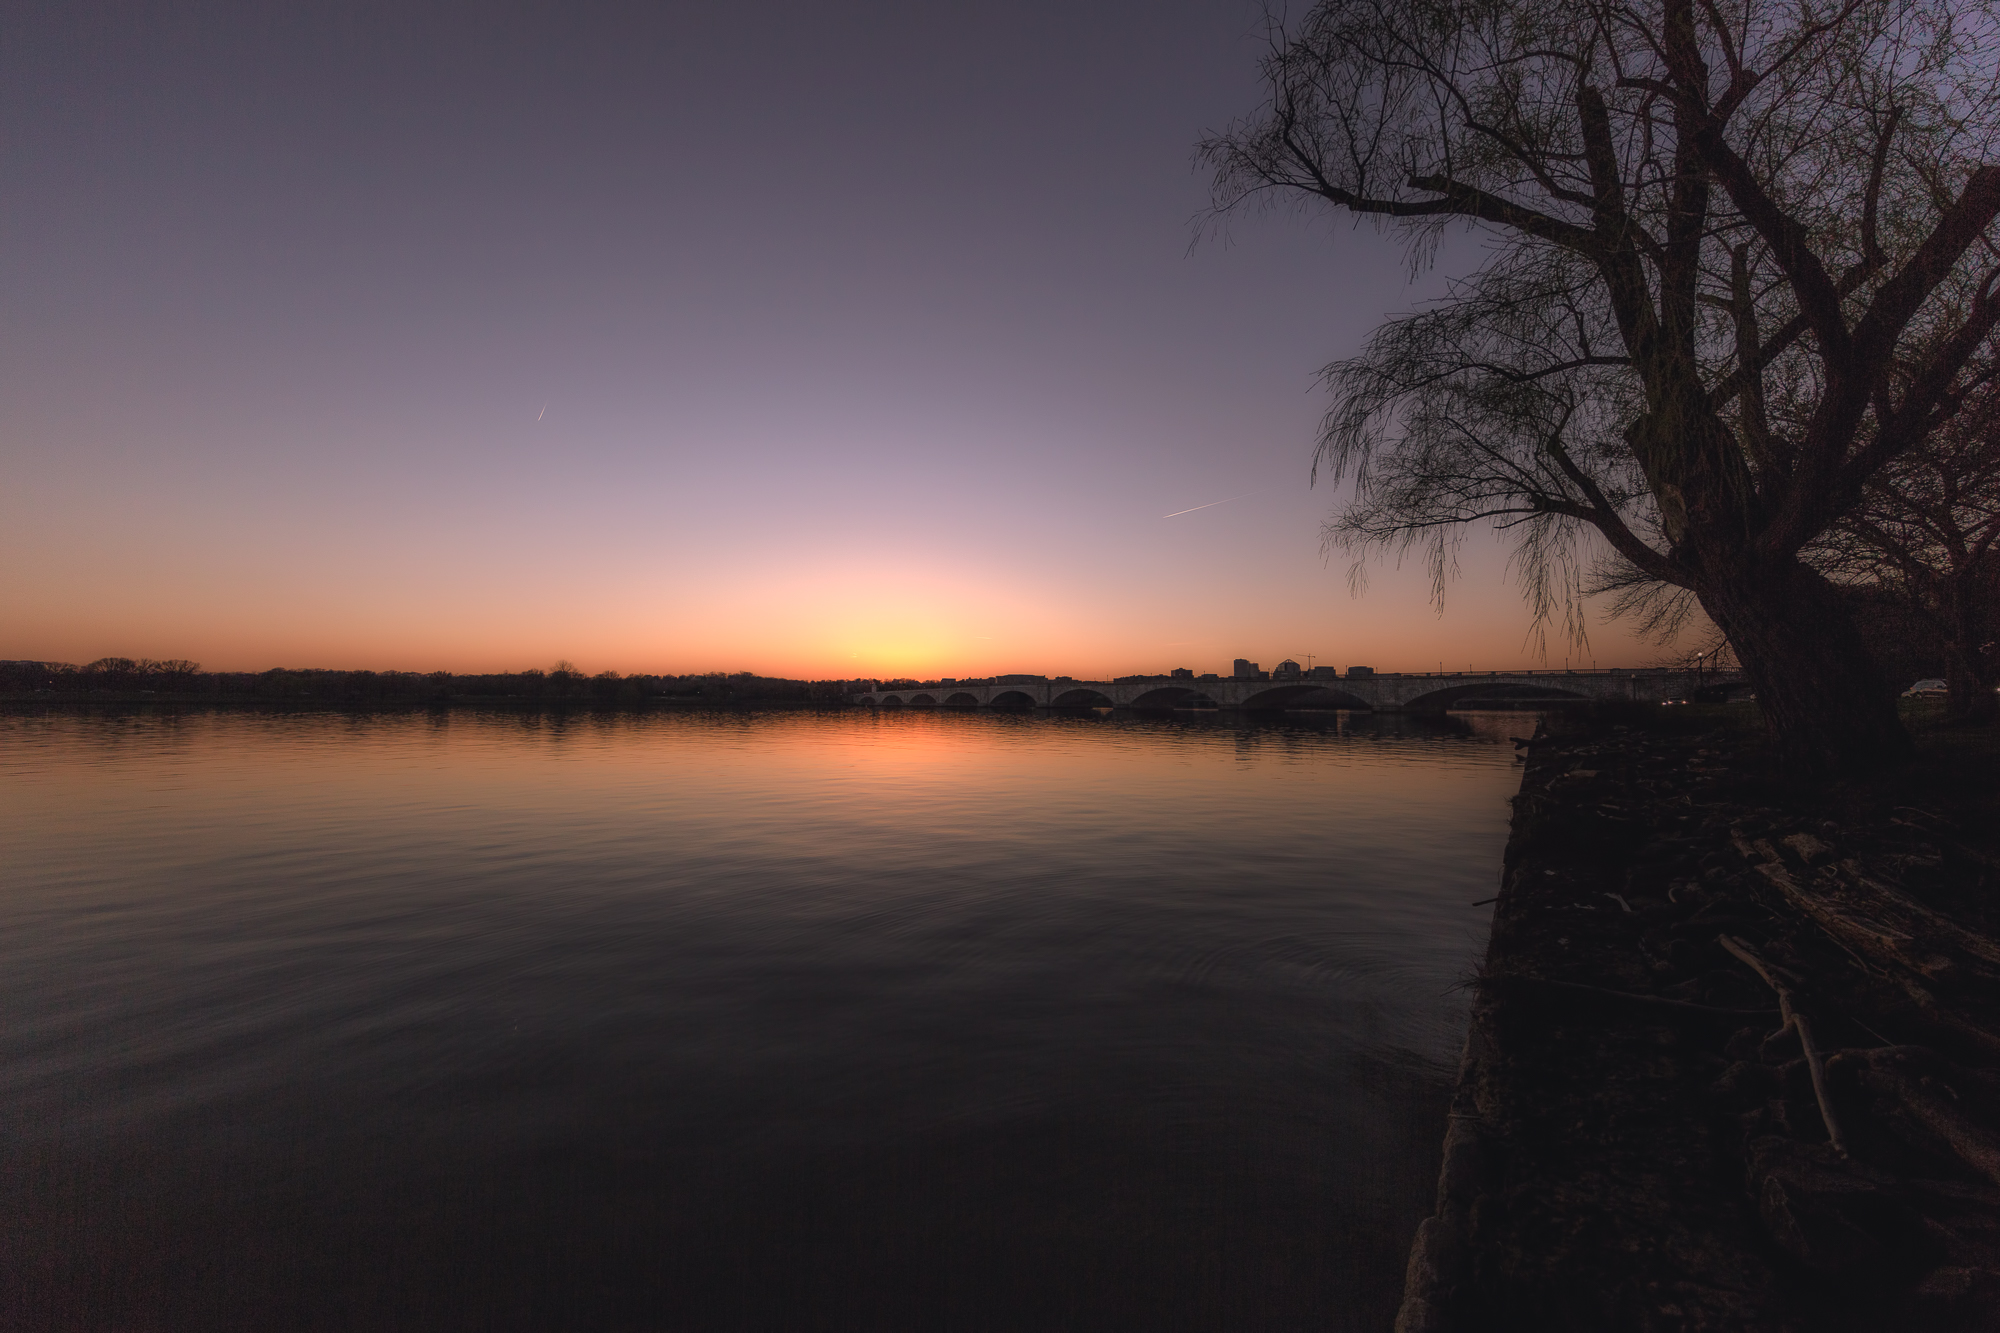 Sunset on the Potomac River, Washington DC, Memorial Bridge